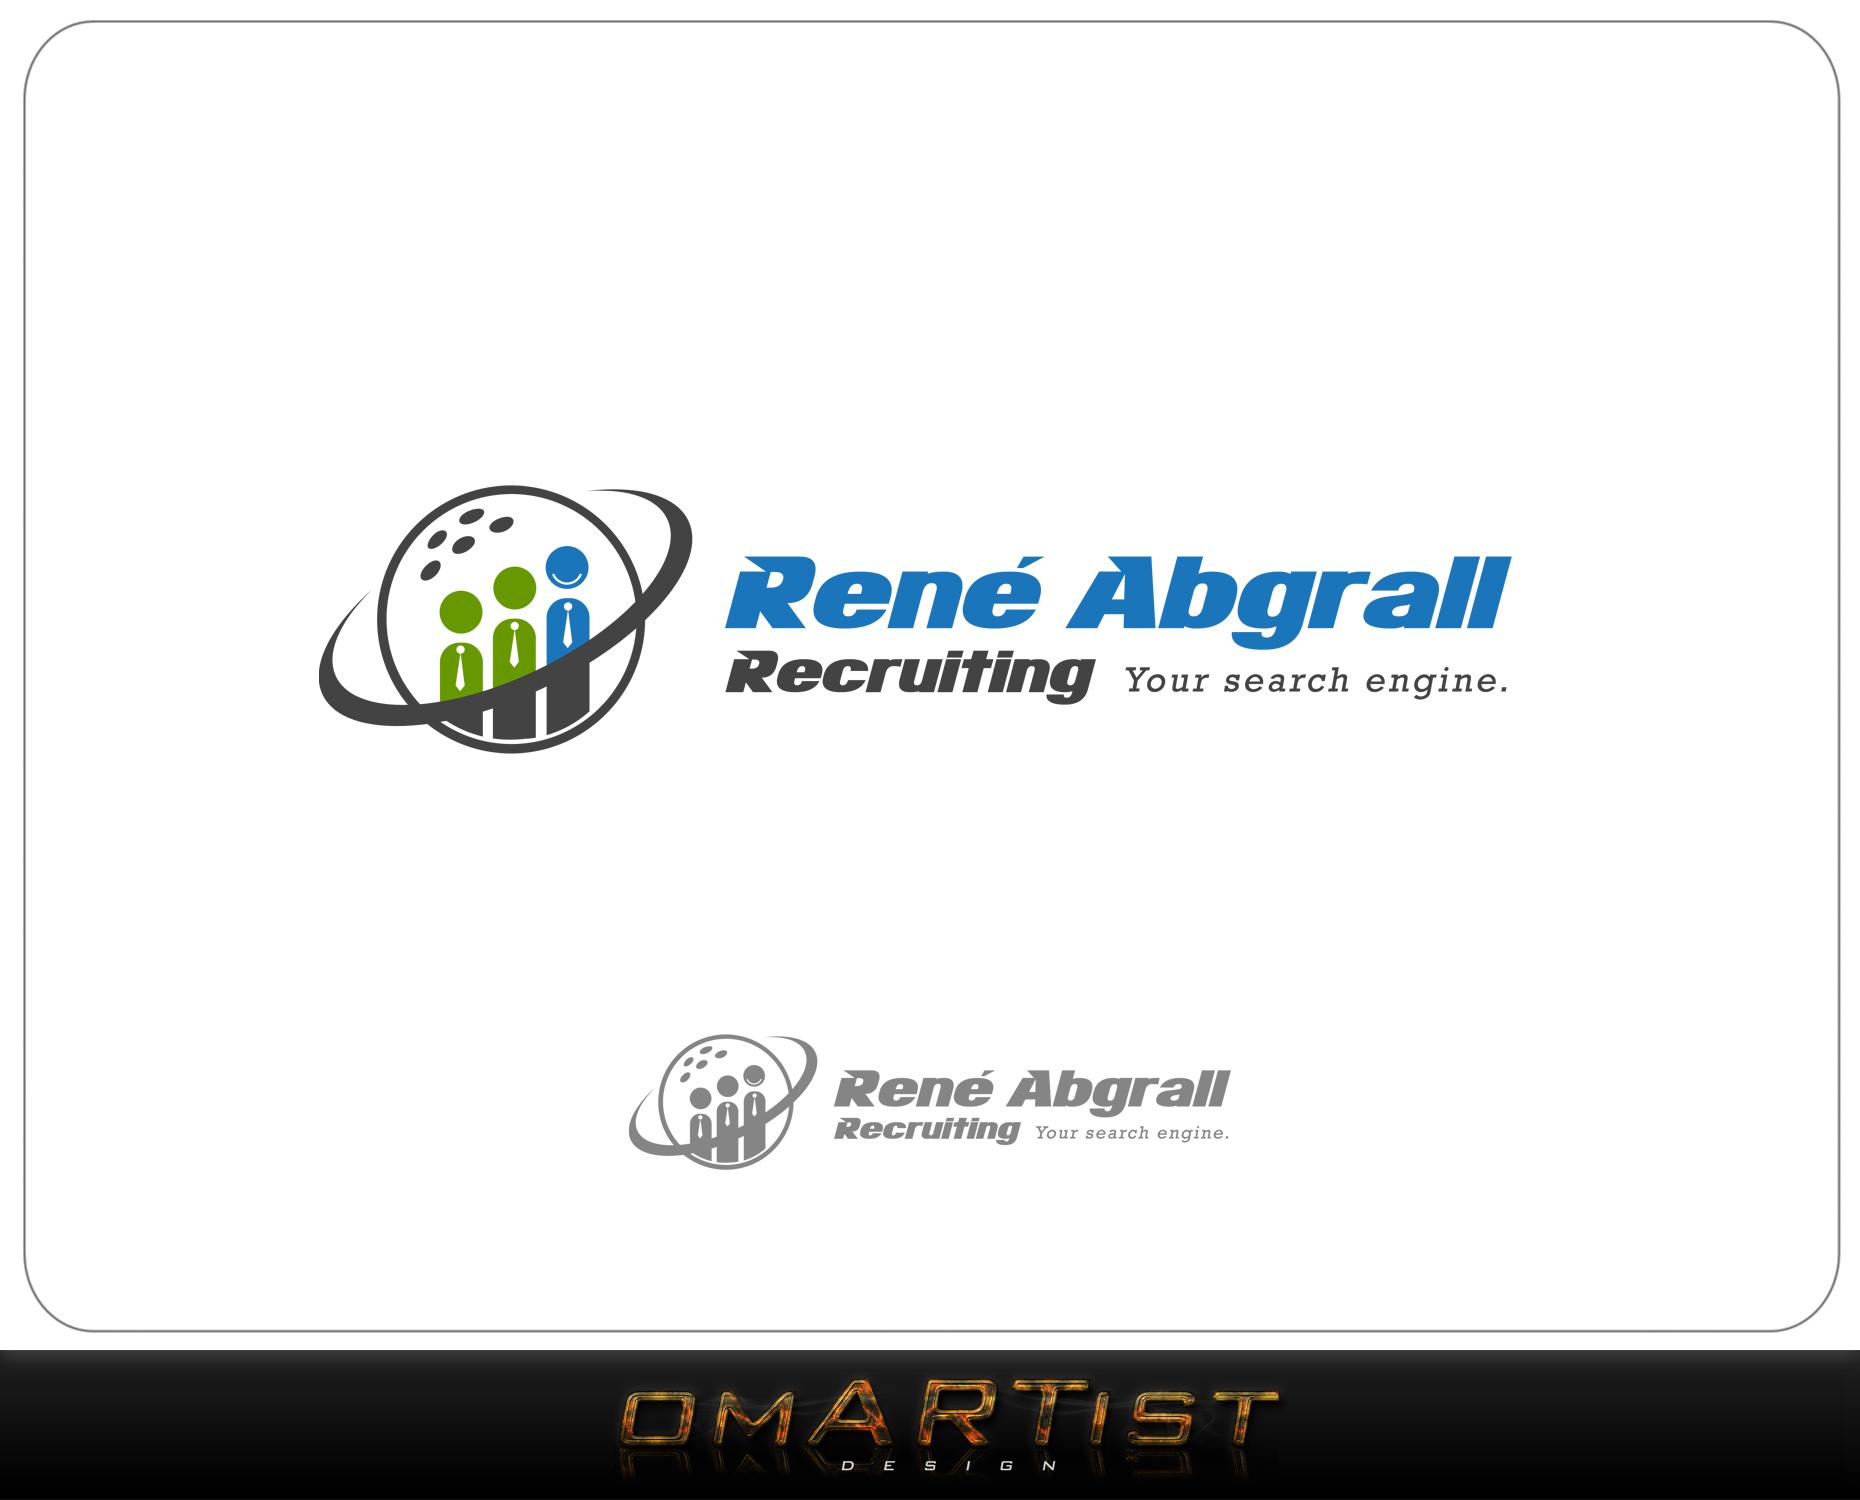 Logo Design by omARTist - Entry No. 42 in the Logo Design Contest Artistic Logo Design for René Abgrall Recruiting.